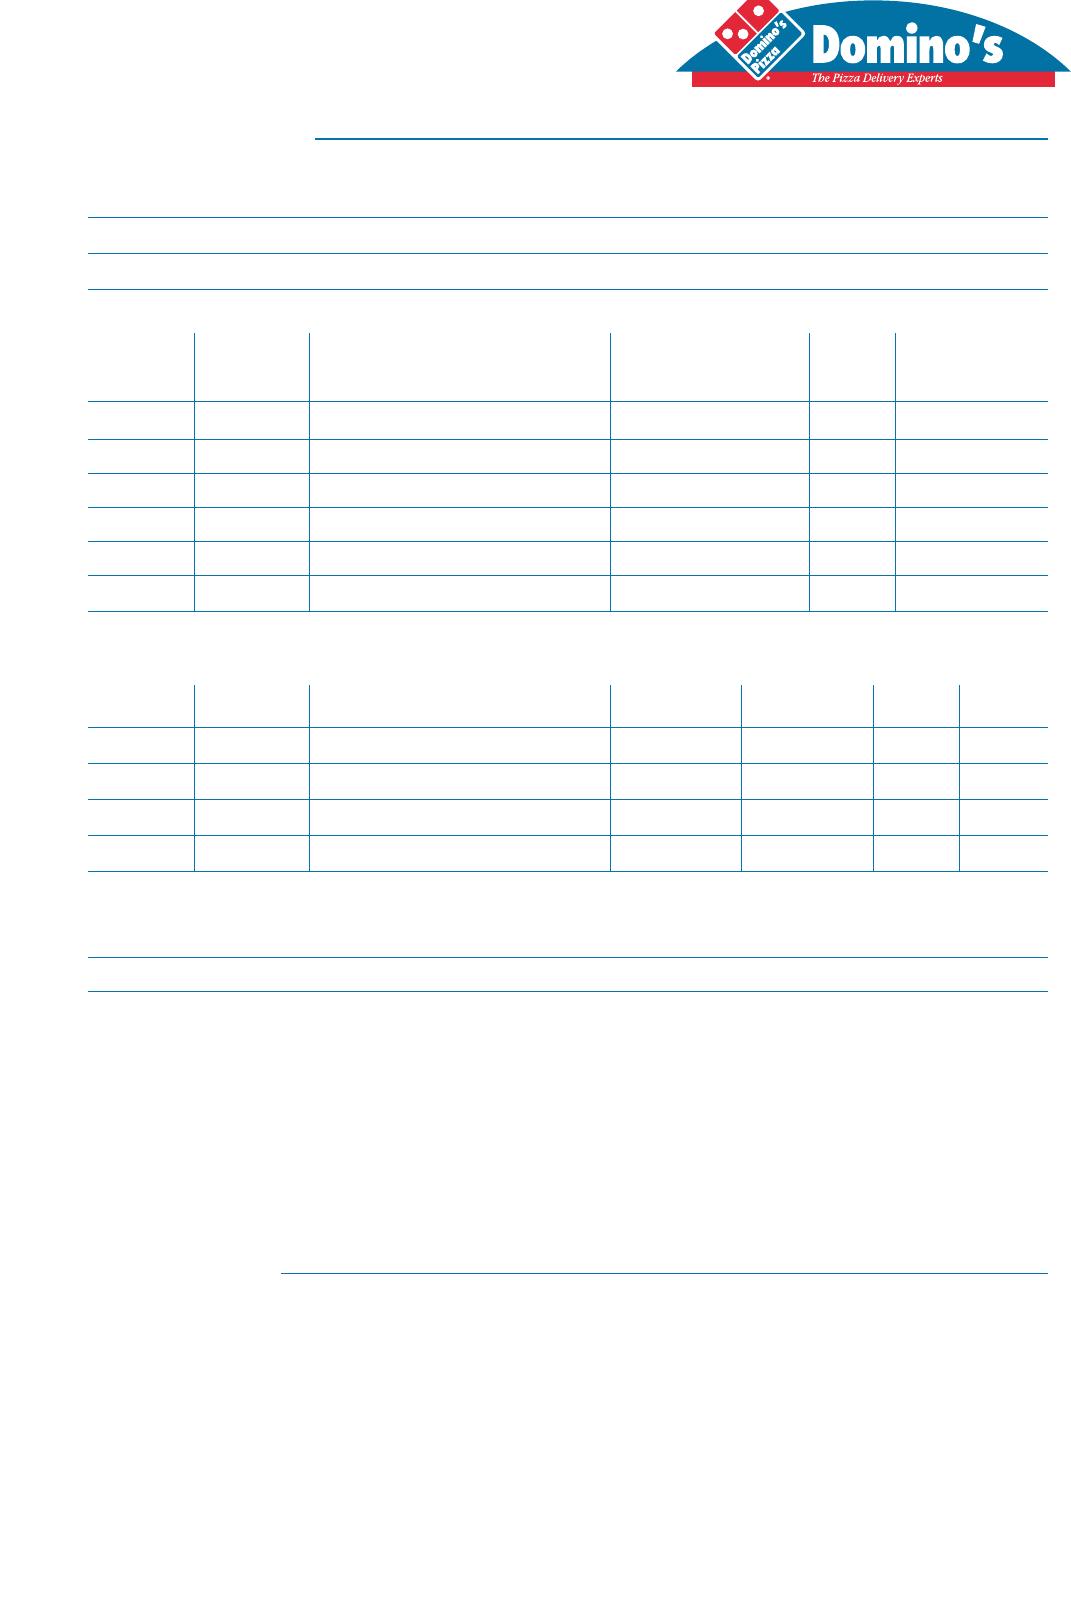 Free Printable Domino S Job Application Form